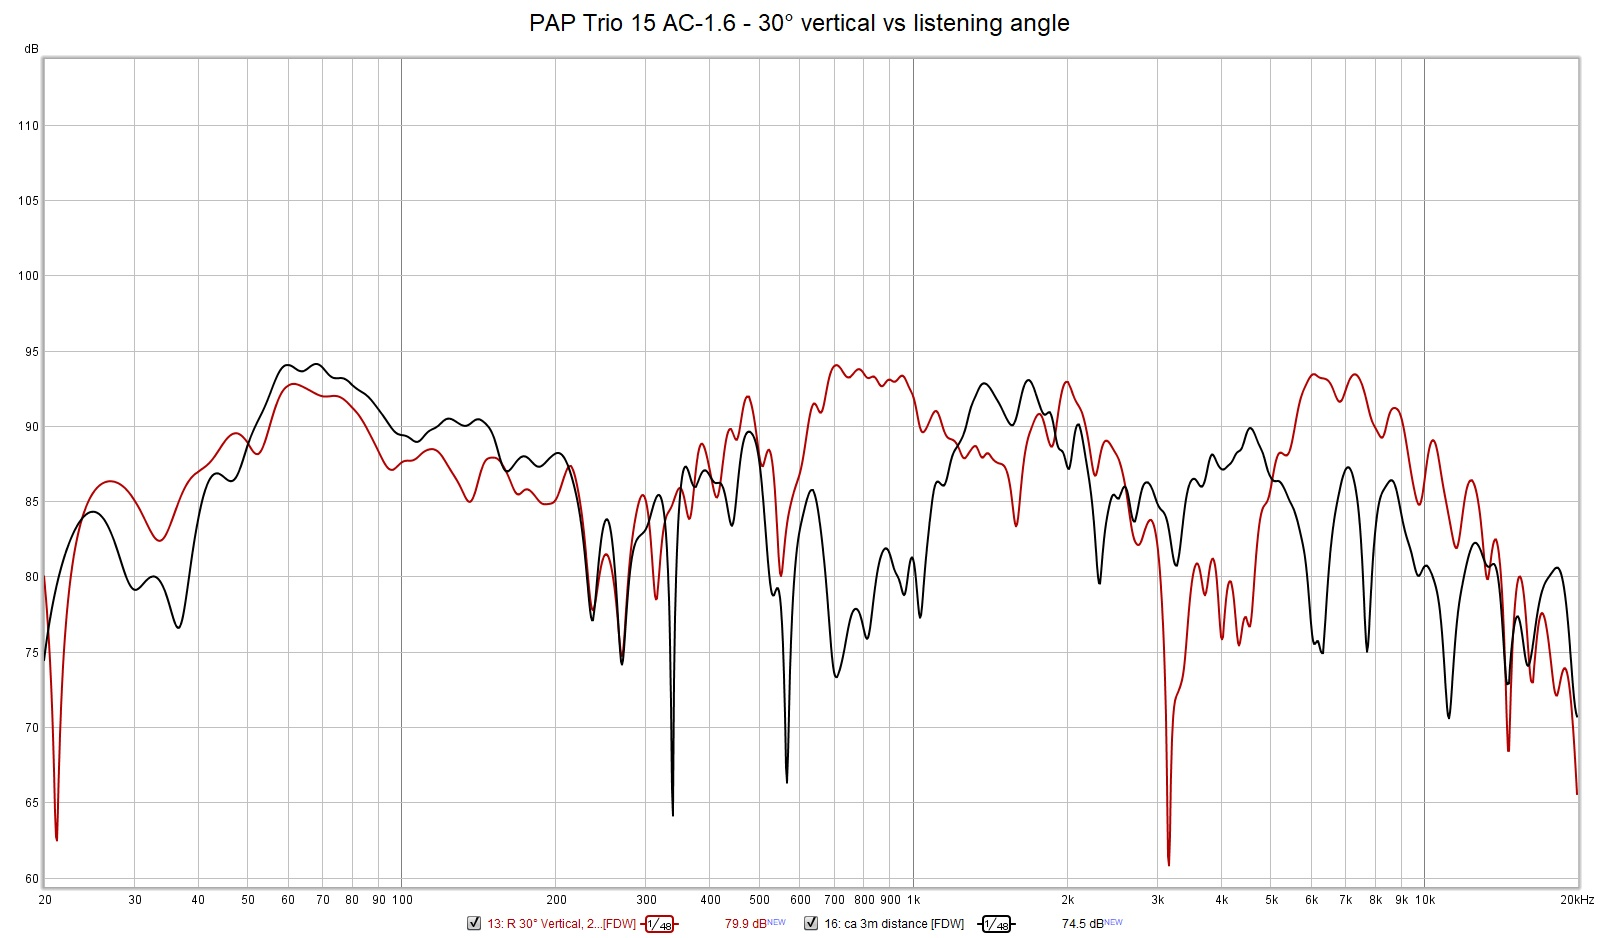 PAP Trio 15 AC-1.6 - 30° vertical vs listening angle.jpg